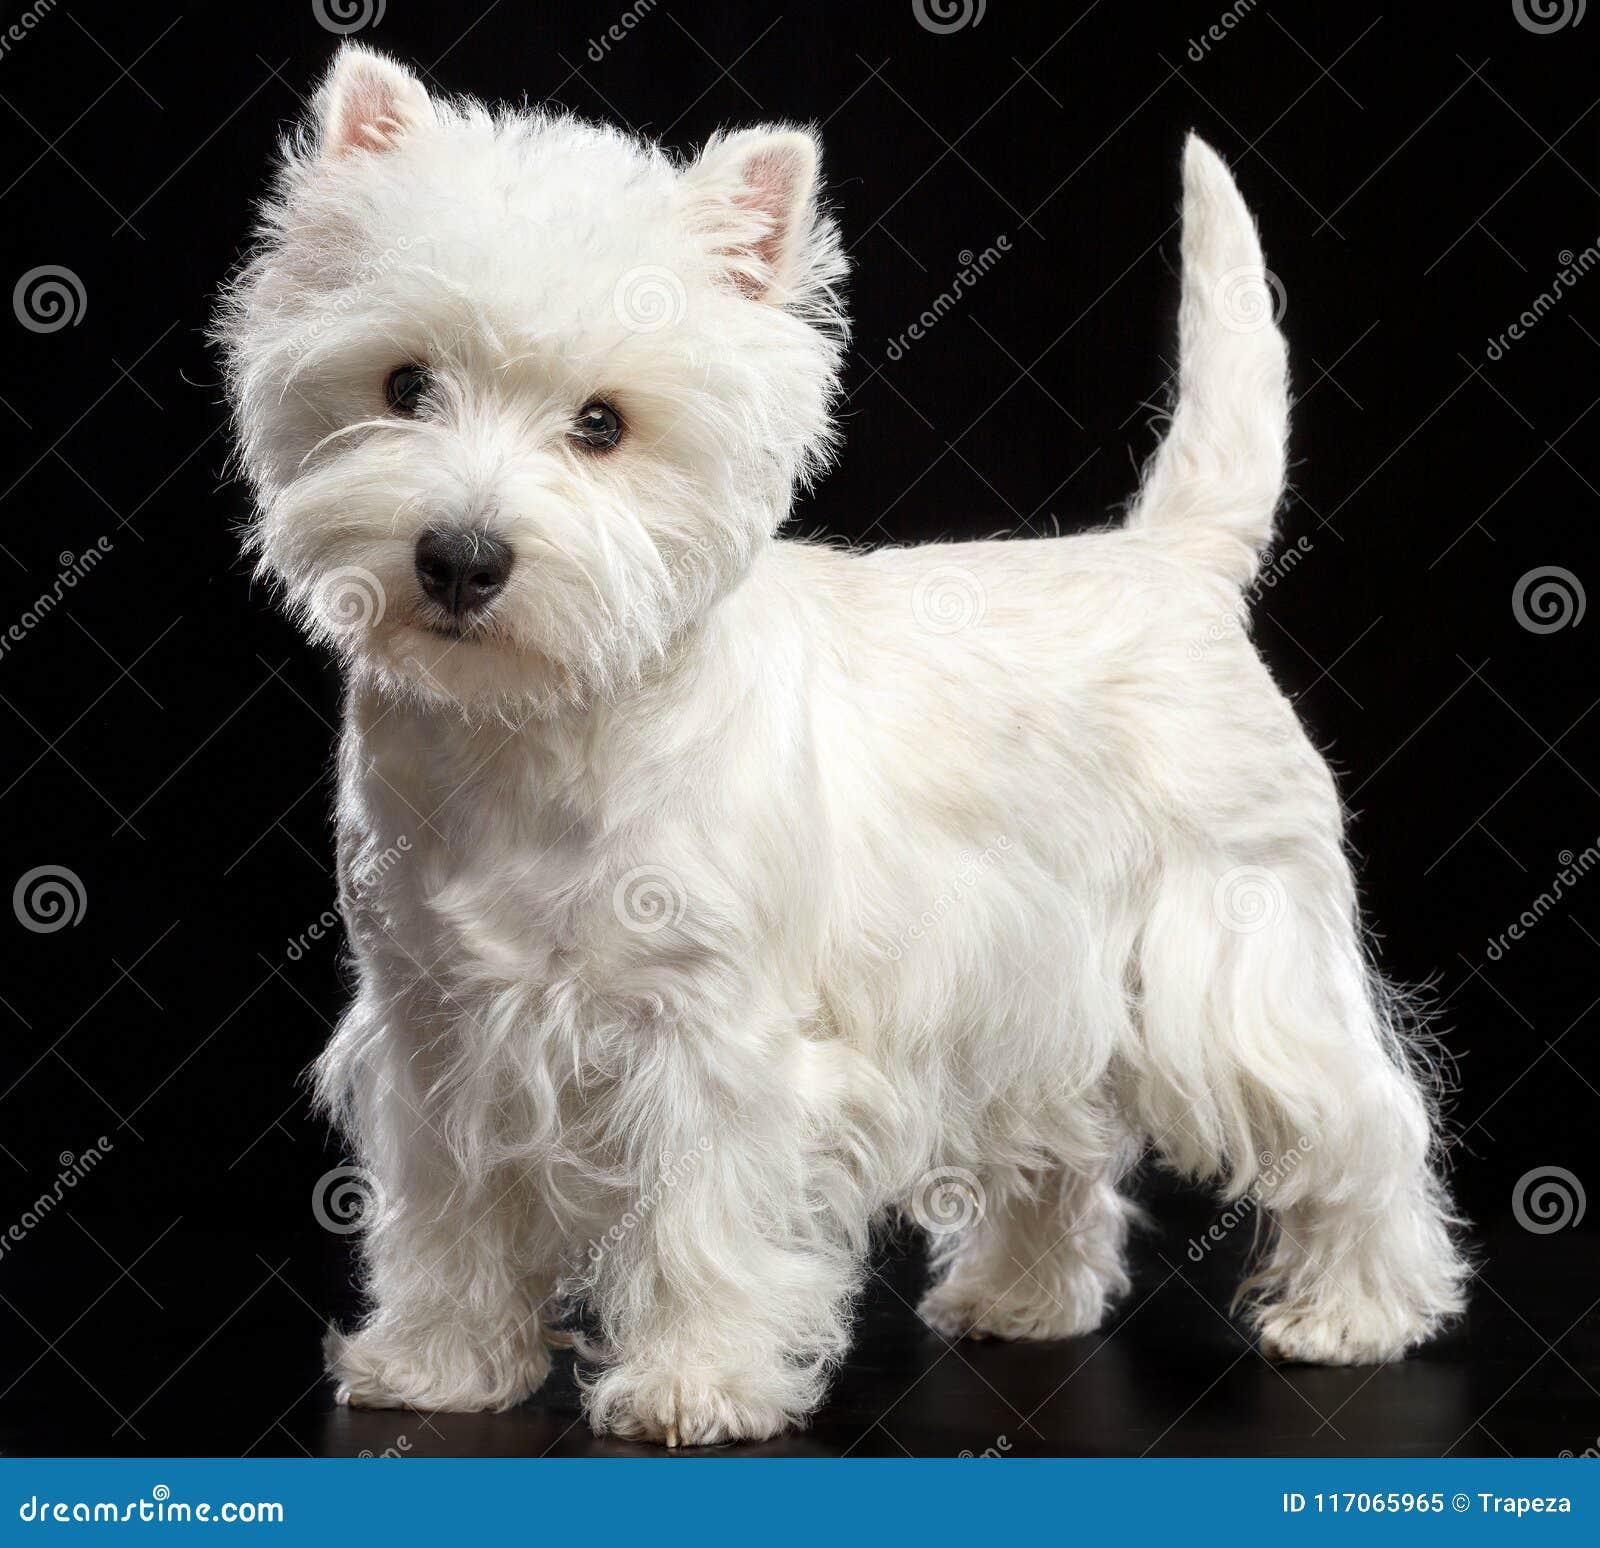 West Highland White Terrier Dog Isolated On Black Background Stock Image Image Of Terrier Black 117065965